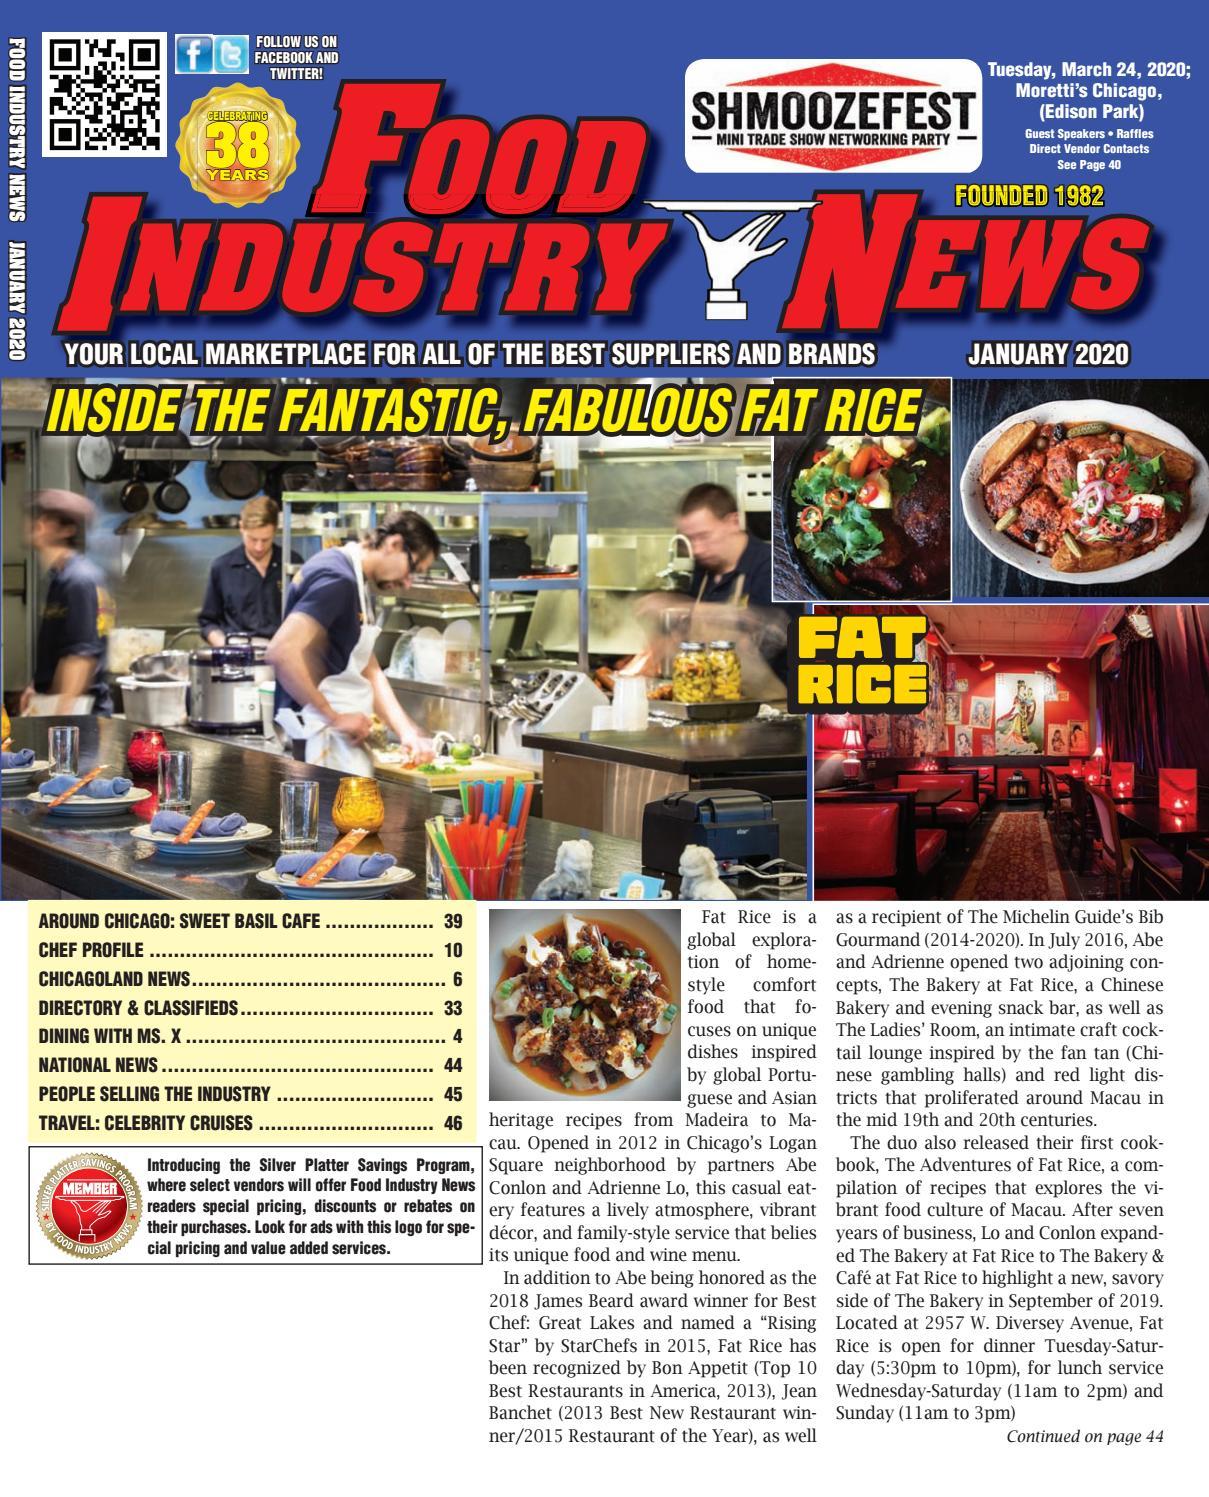 Food Industry News January 2020 Web Edition within Illinois Rut 2020